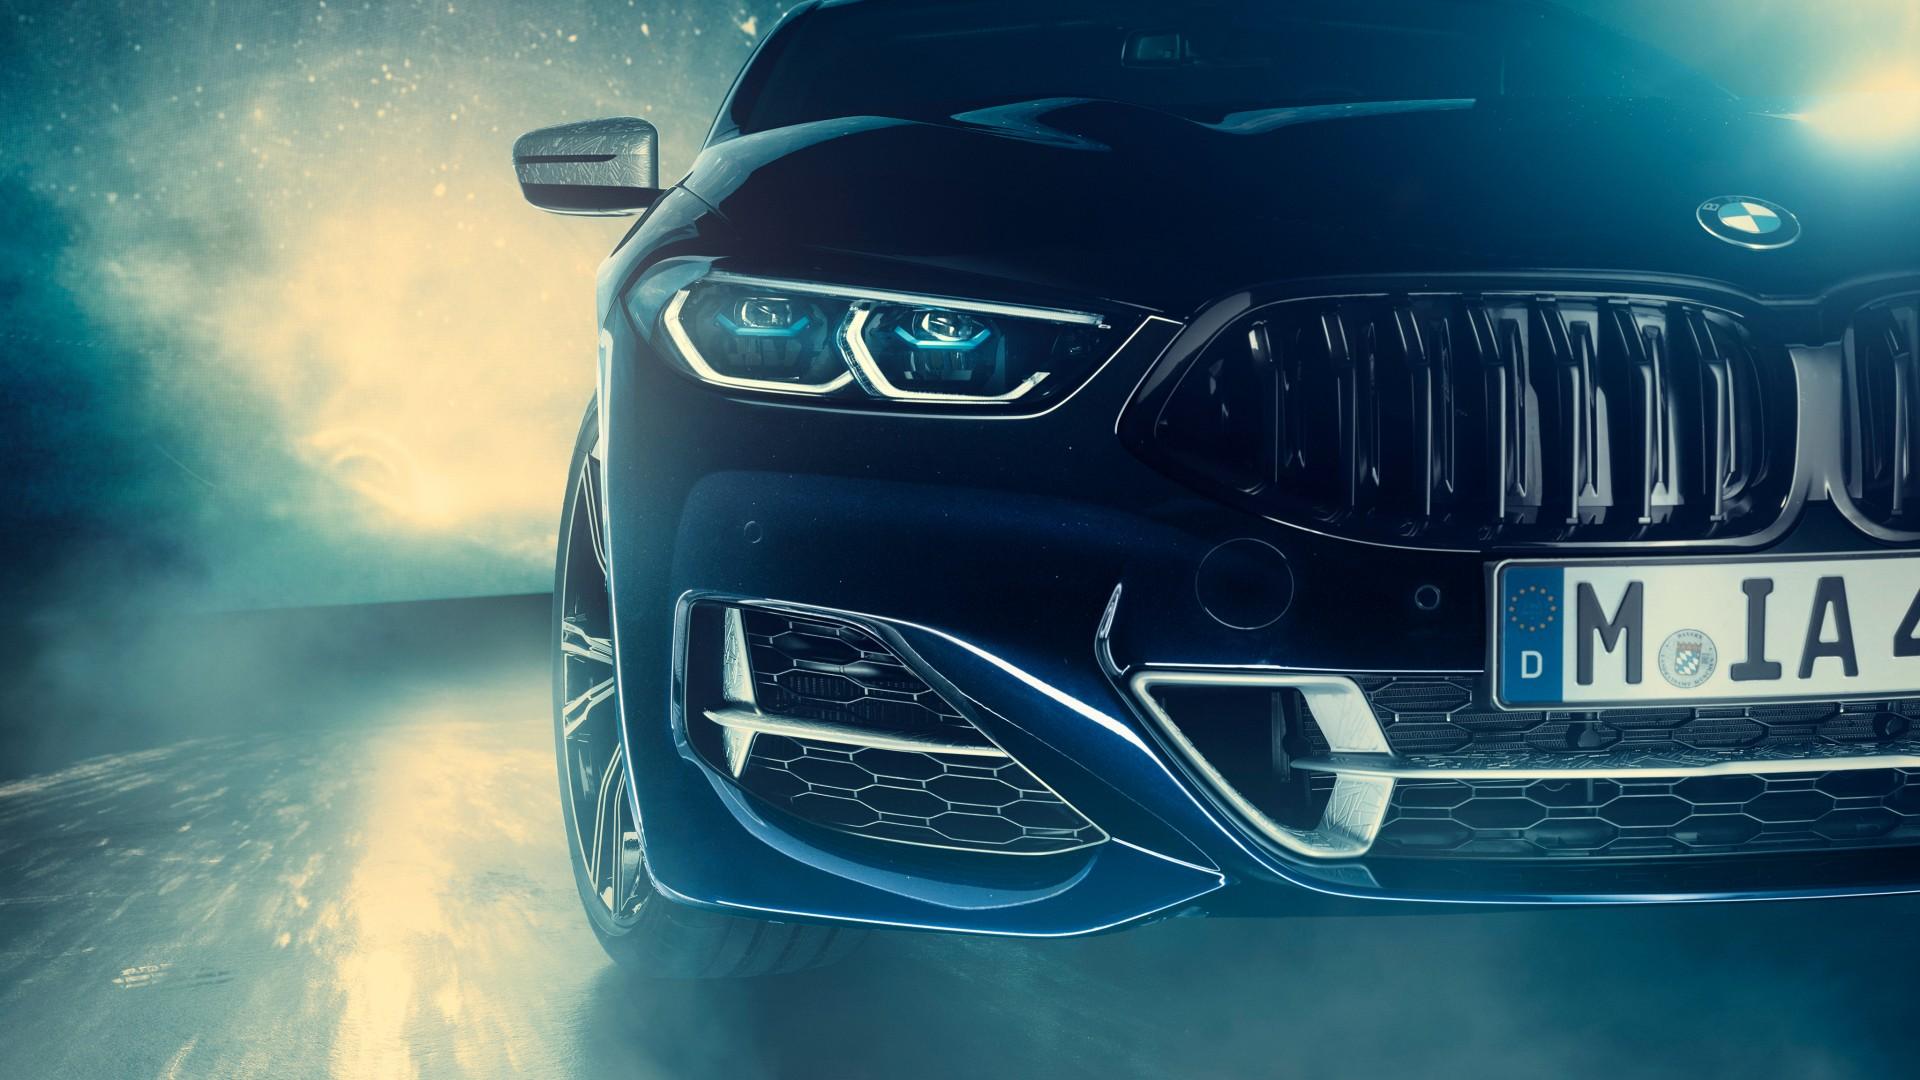 Bmw Car Wallpaper Bmw Individual M850i Xdrive Night Sky 2019 4k Wallpaper